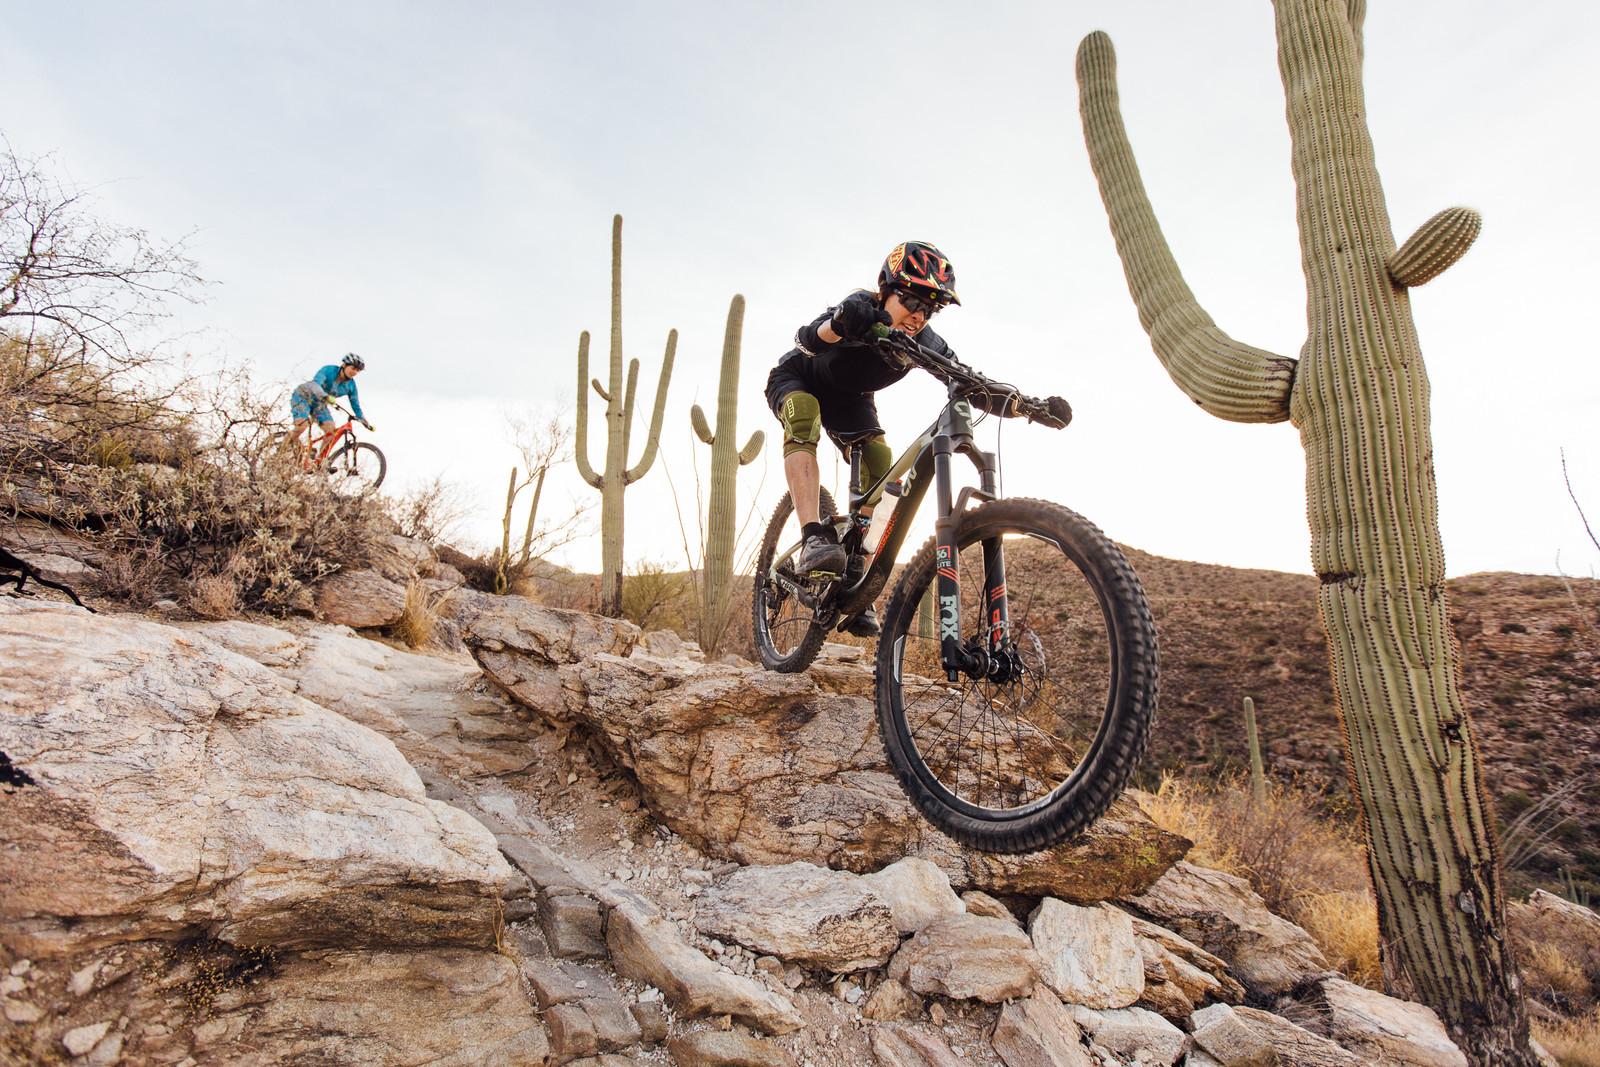 Liv Hail Advanced 1 - 2017 Vital MTB Test Sessions - Liv Hail Advanced 1 - 2017 Vital MTB Test Sessions - Mountain Biking Pictures - Vital MTB